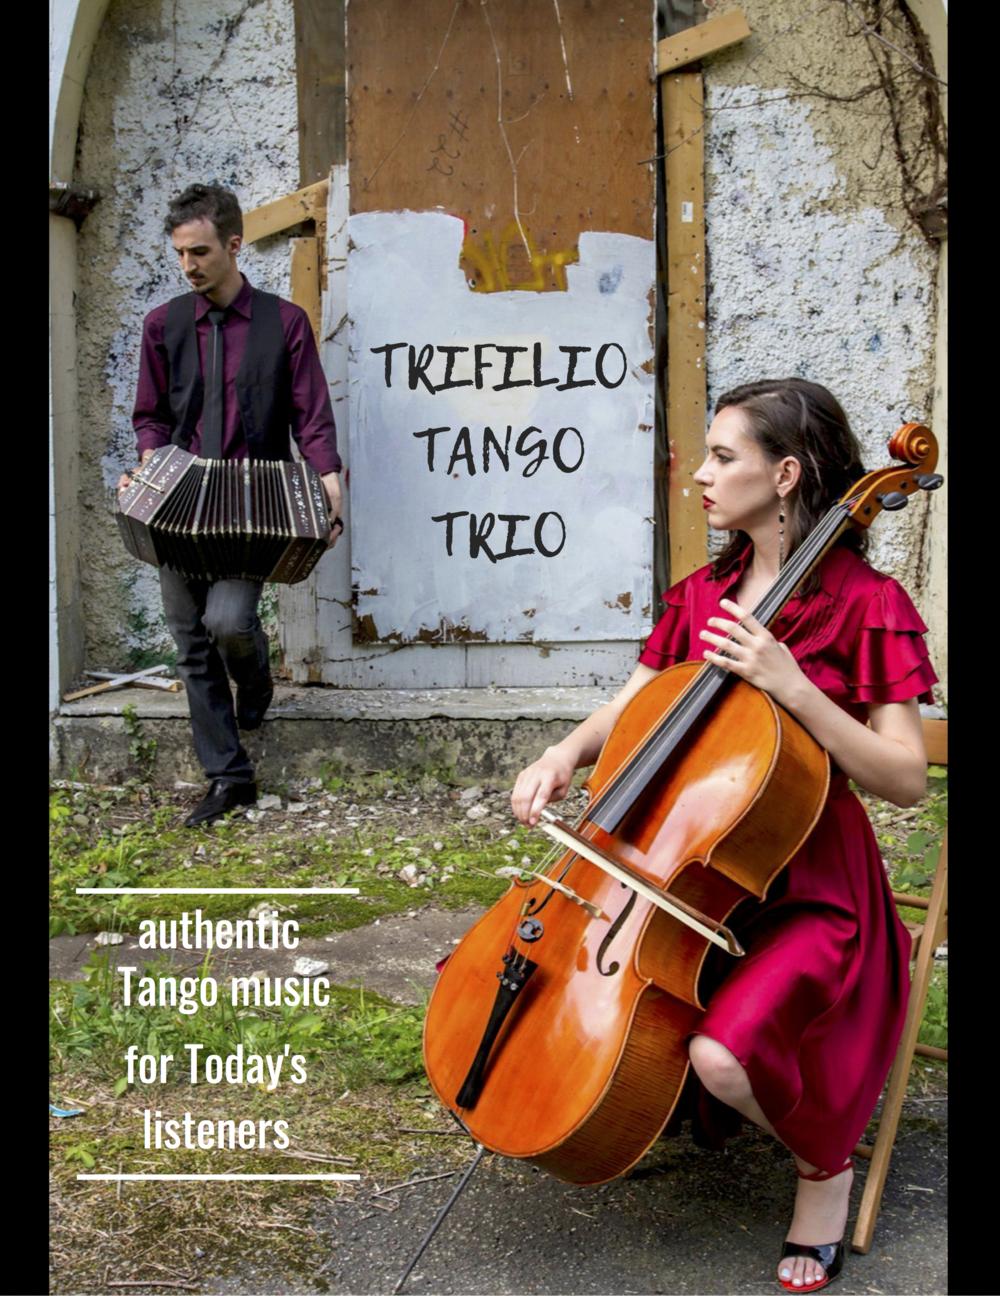 Trifilio Tango Trio_ Piano EPK 2018.png